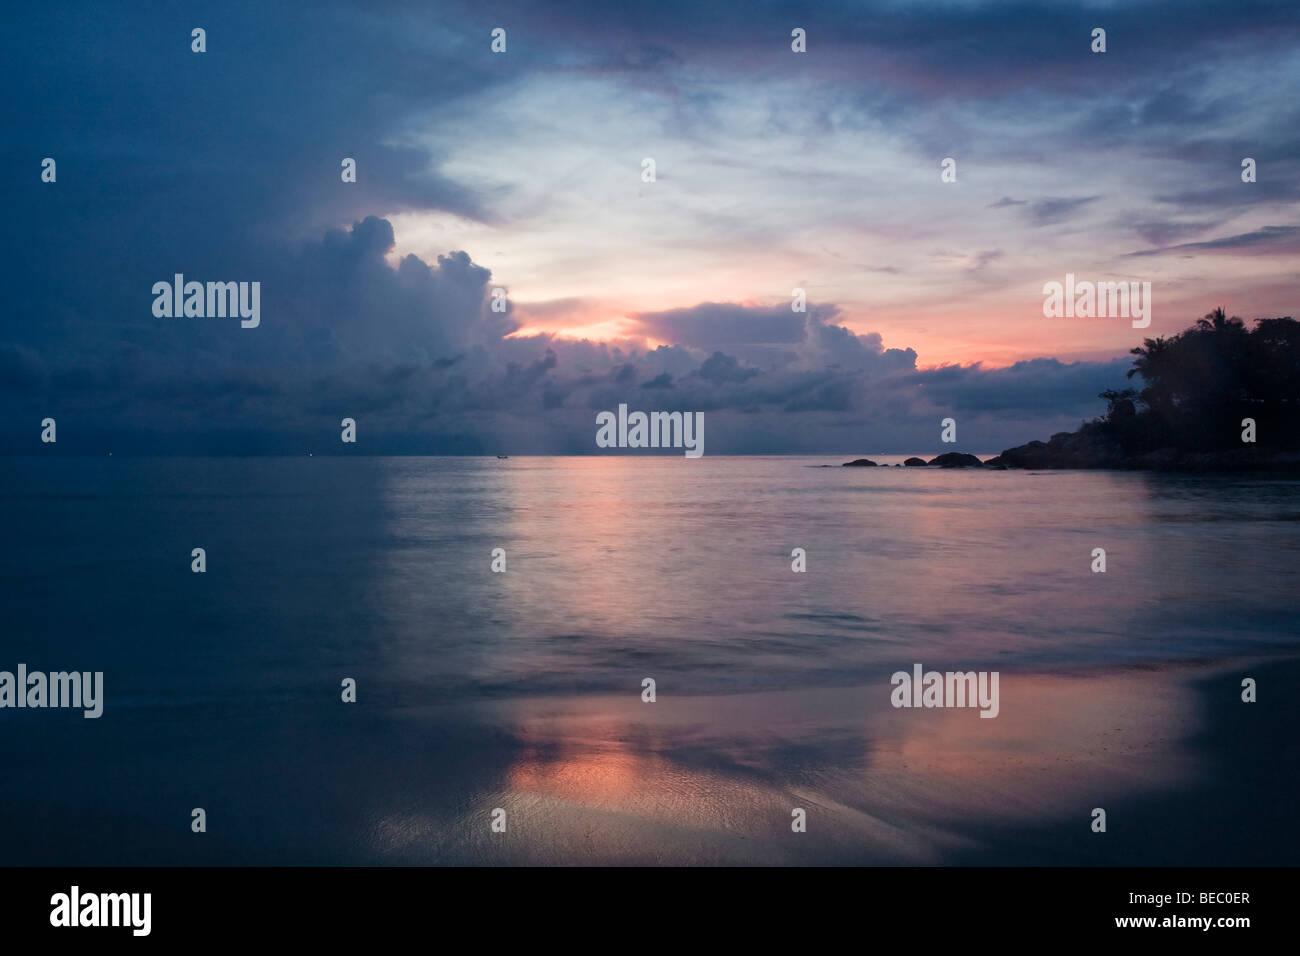 Beach at sunrise on Koh Samui, Thailand Stock Photo